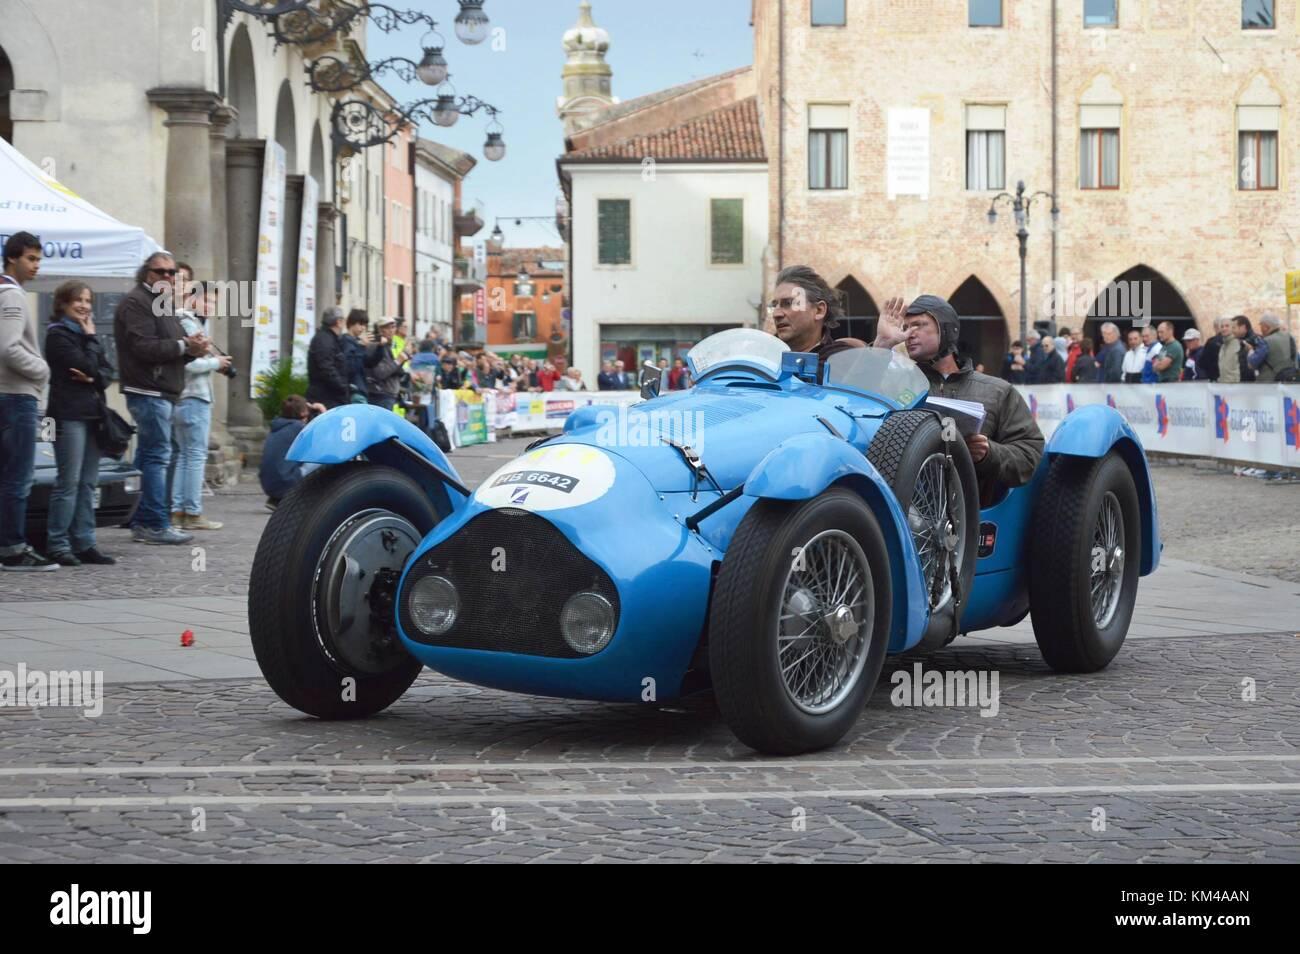 1000 Miles, may 16 2014, Este - Italy: Talbot Lago T 150 C, 1936 - Stock Image